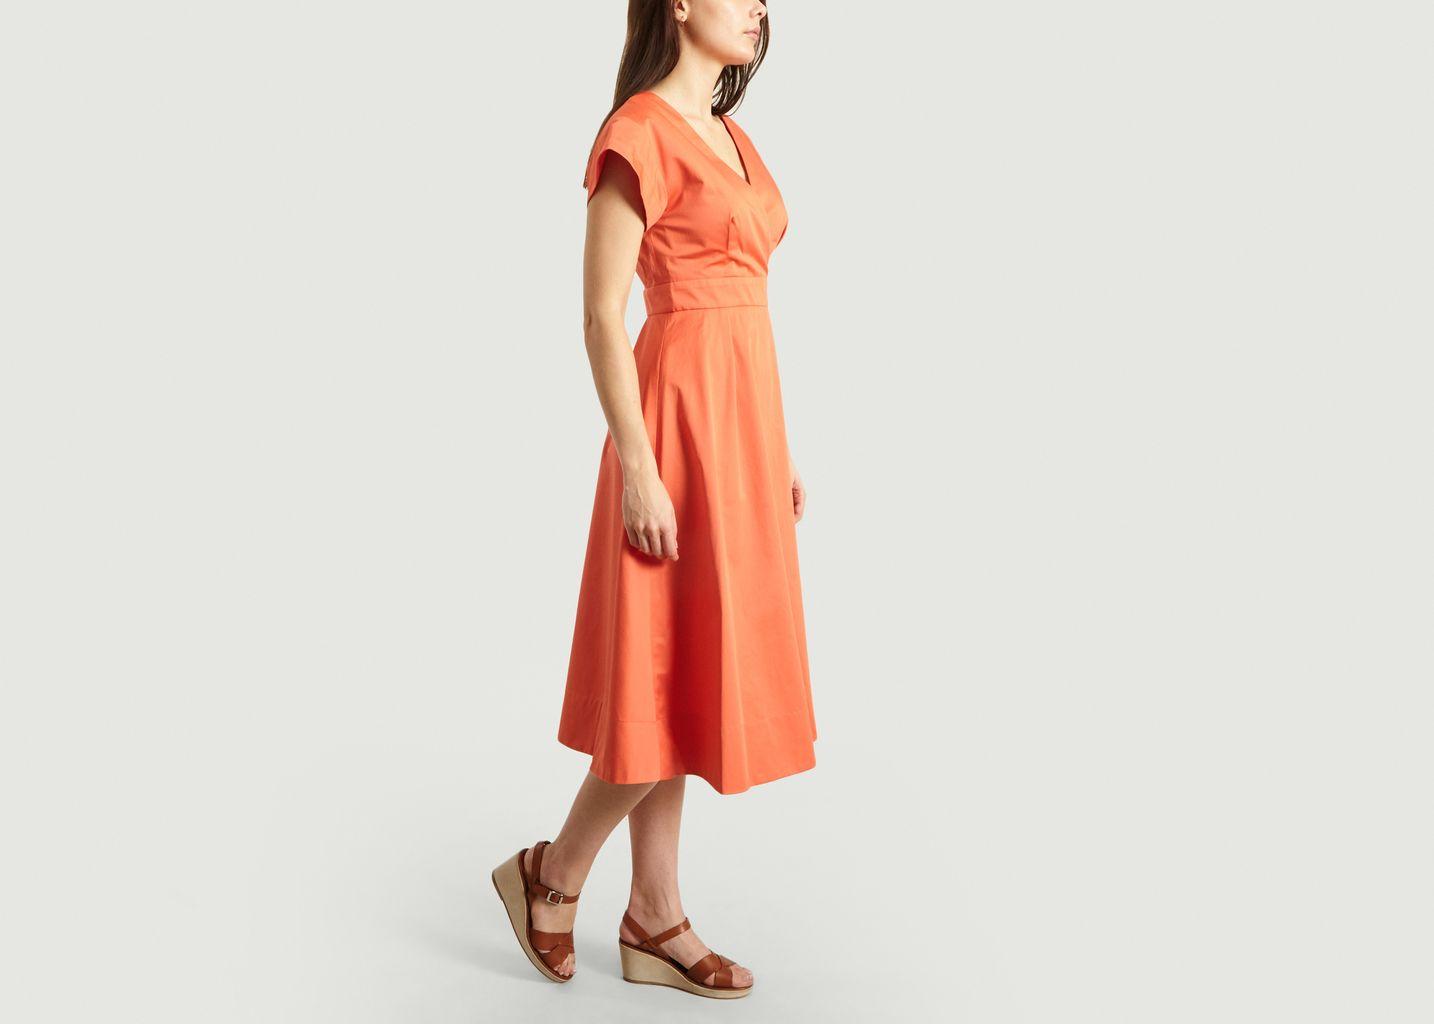 Robe Évasée Mi-Longue - Tara Jarmon